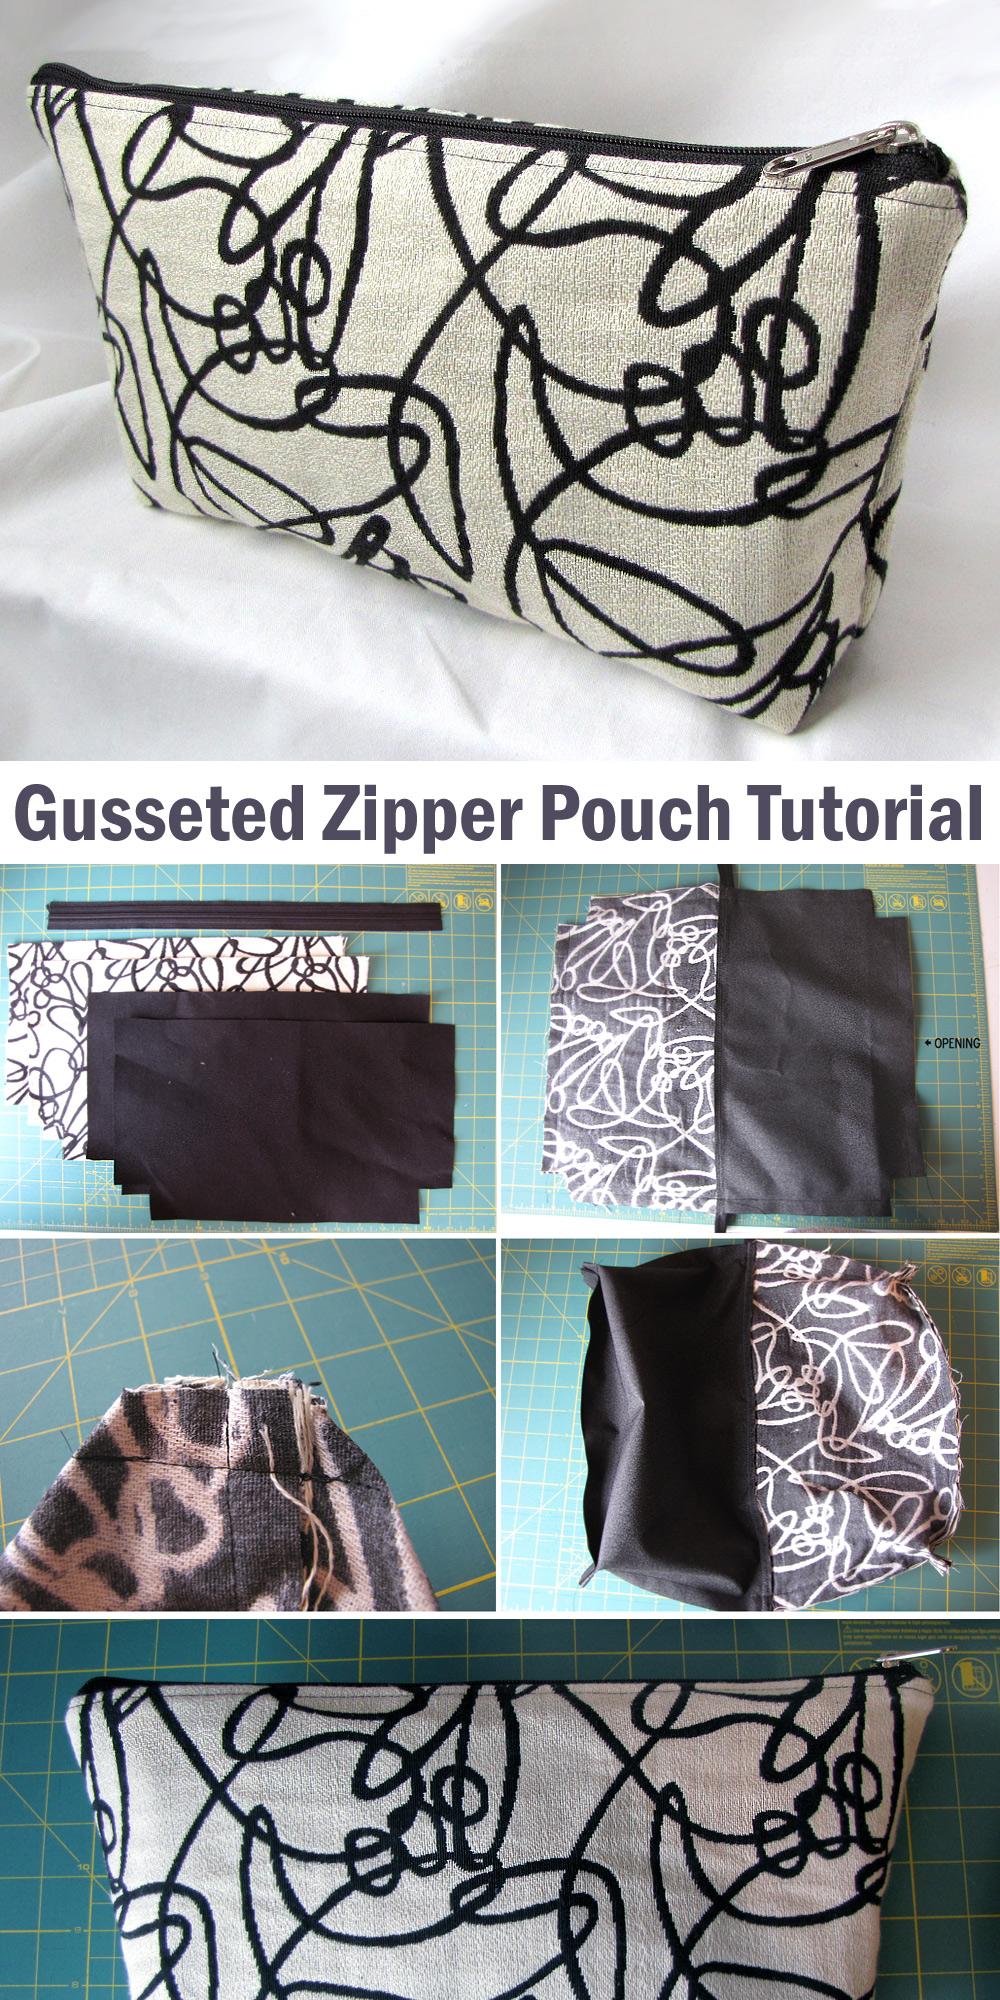 Gusseted Zipper Pouch Tutorial & Pattern